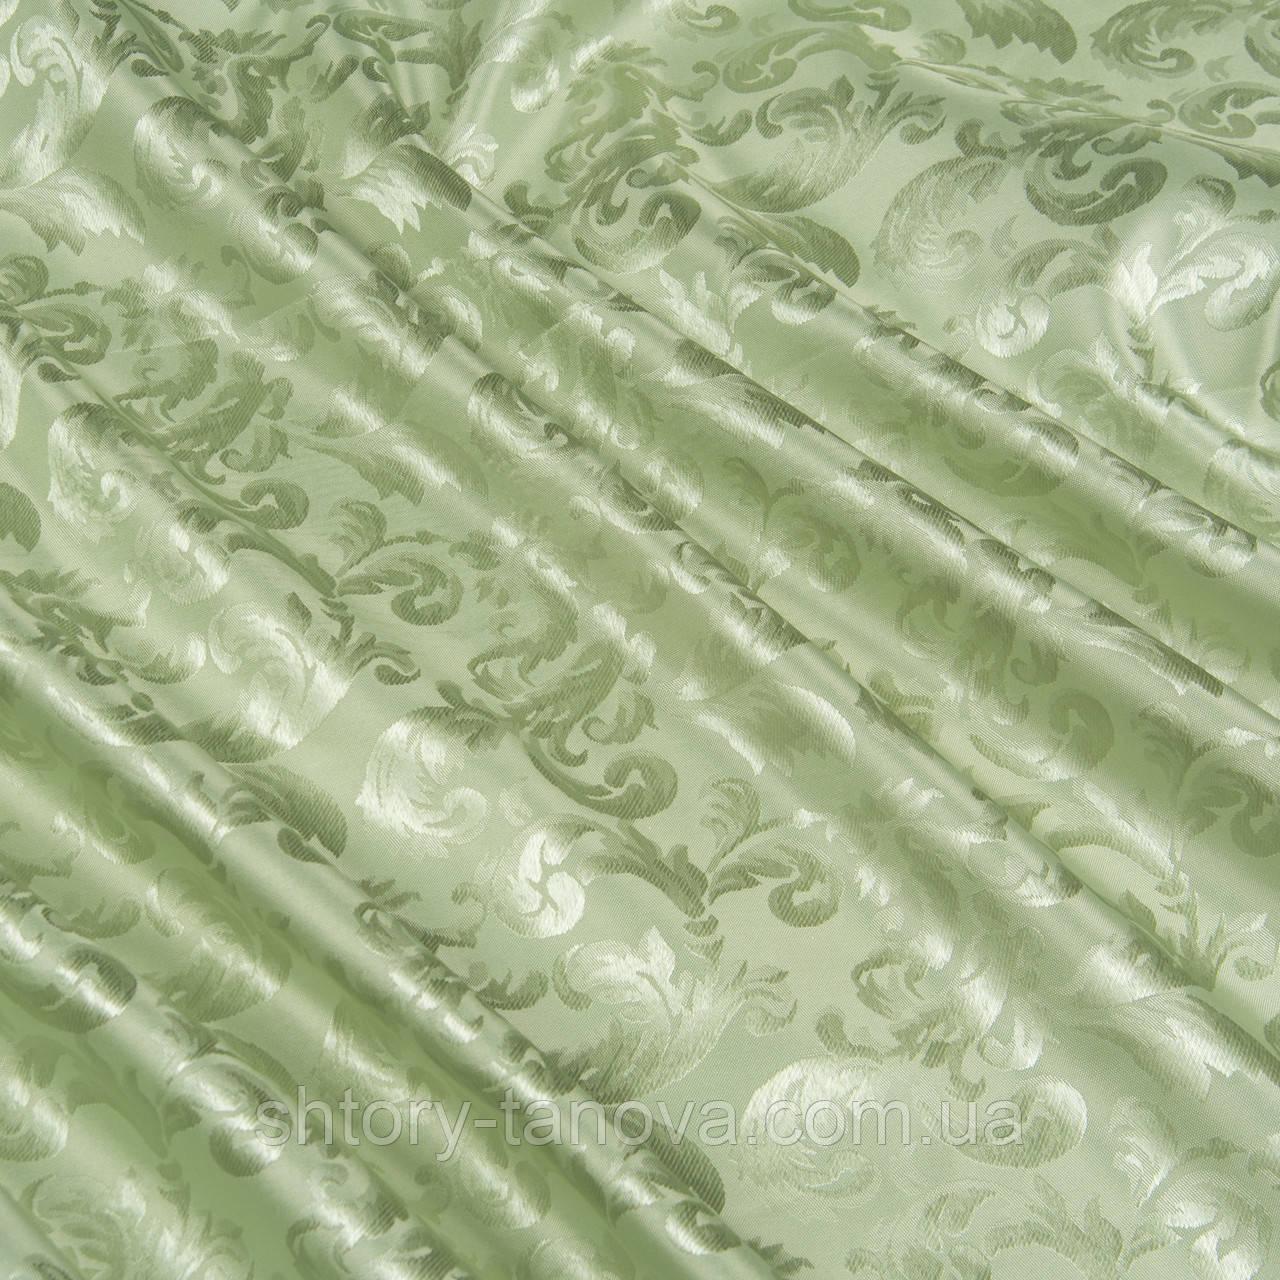 Жаккард алан вязь св. зеленый